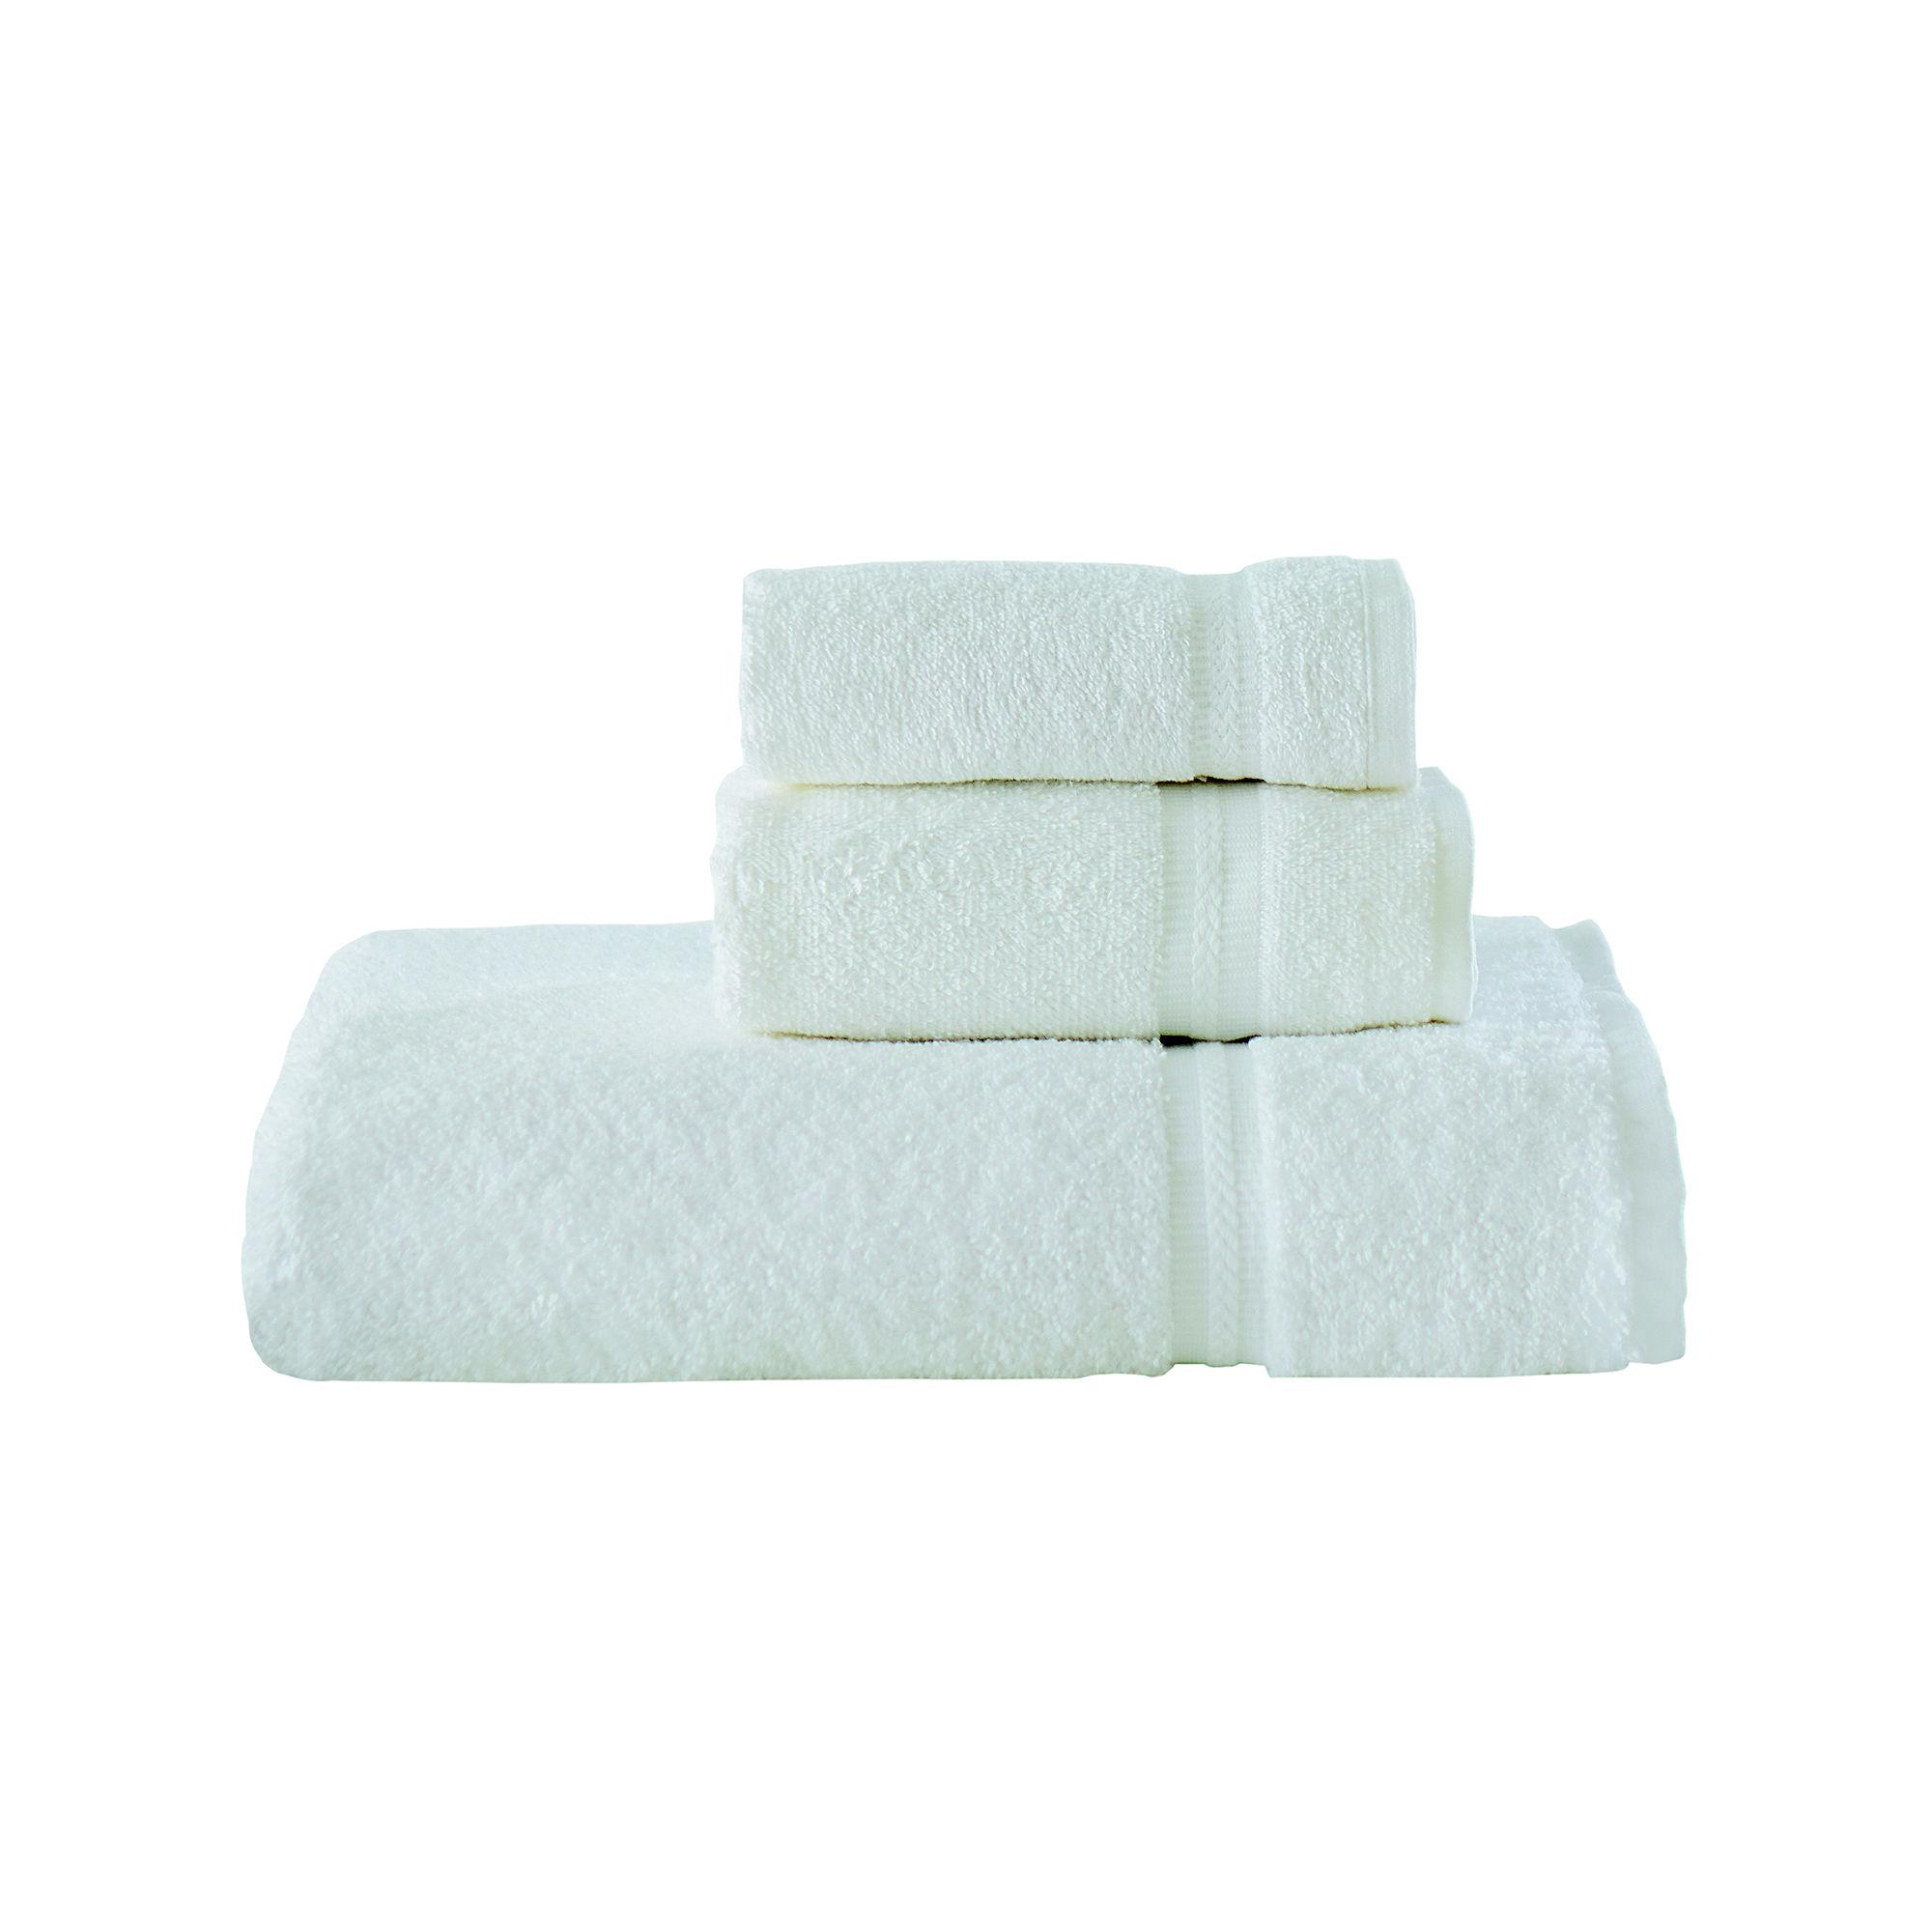 Welingham 120-pc 16x30 Hand Towel Set